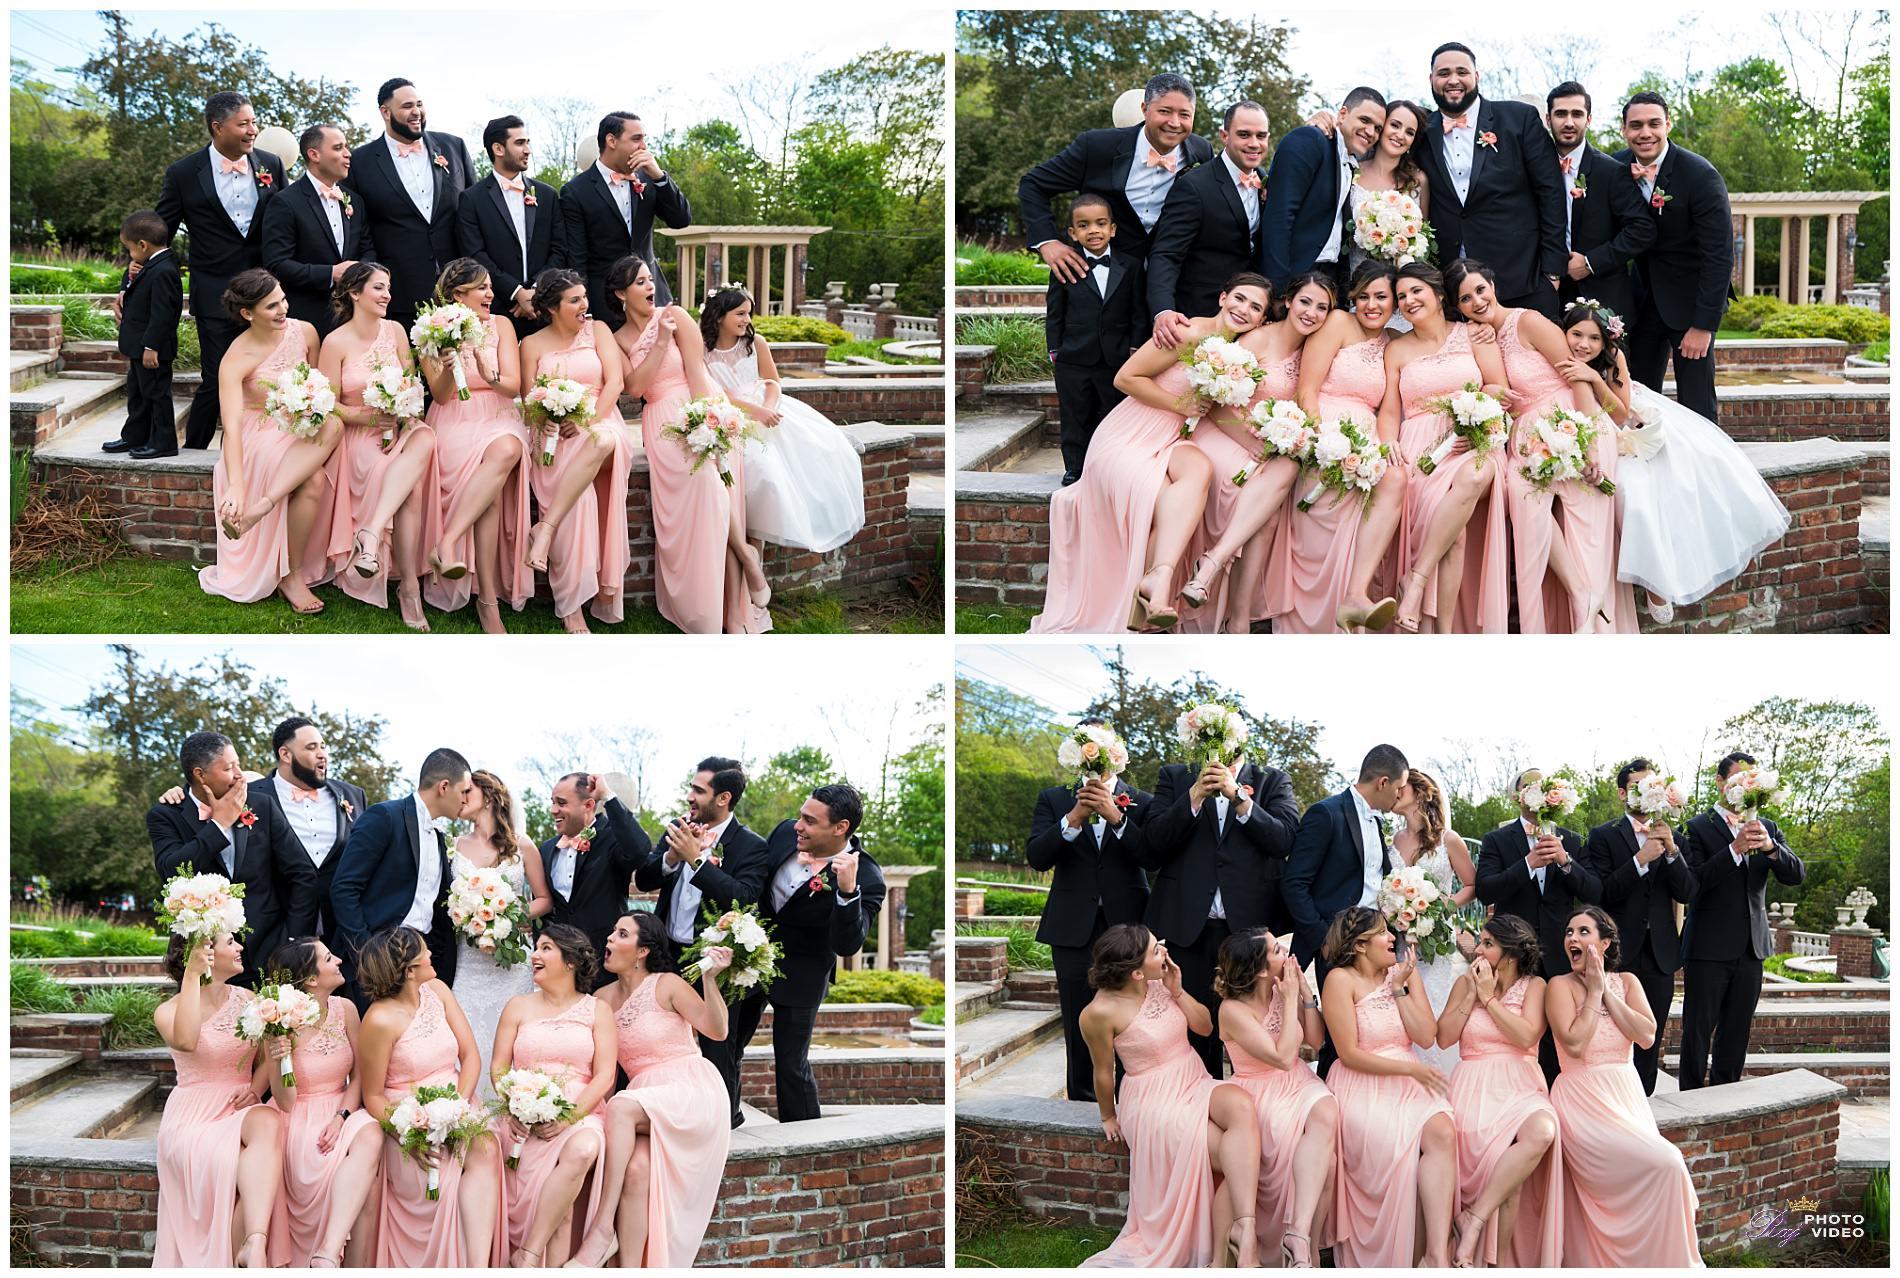 The-Manor-West-Orange-NJ-Wedding-Reception-Yanet-Jose-4.jpg